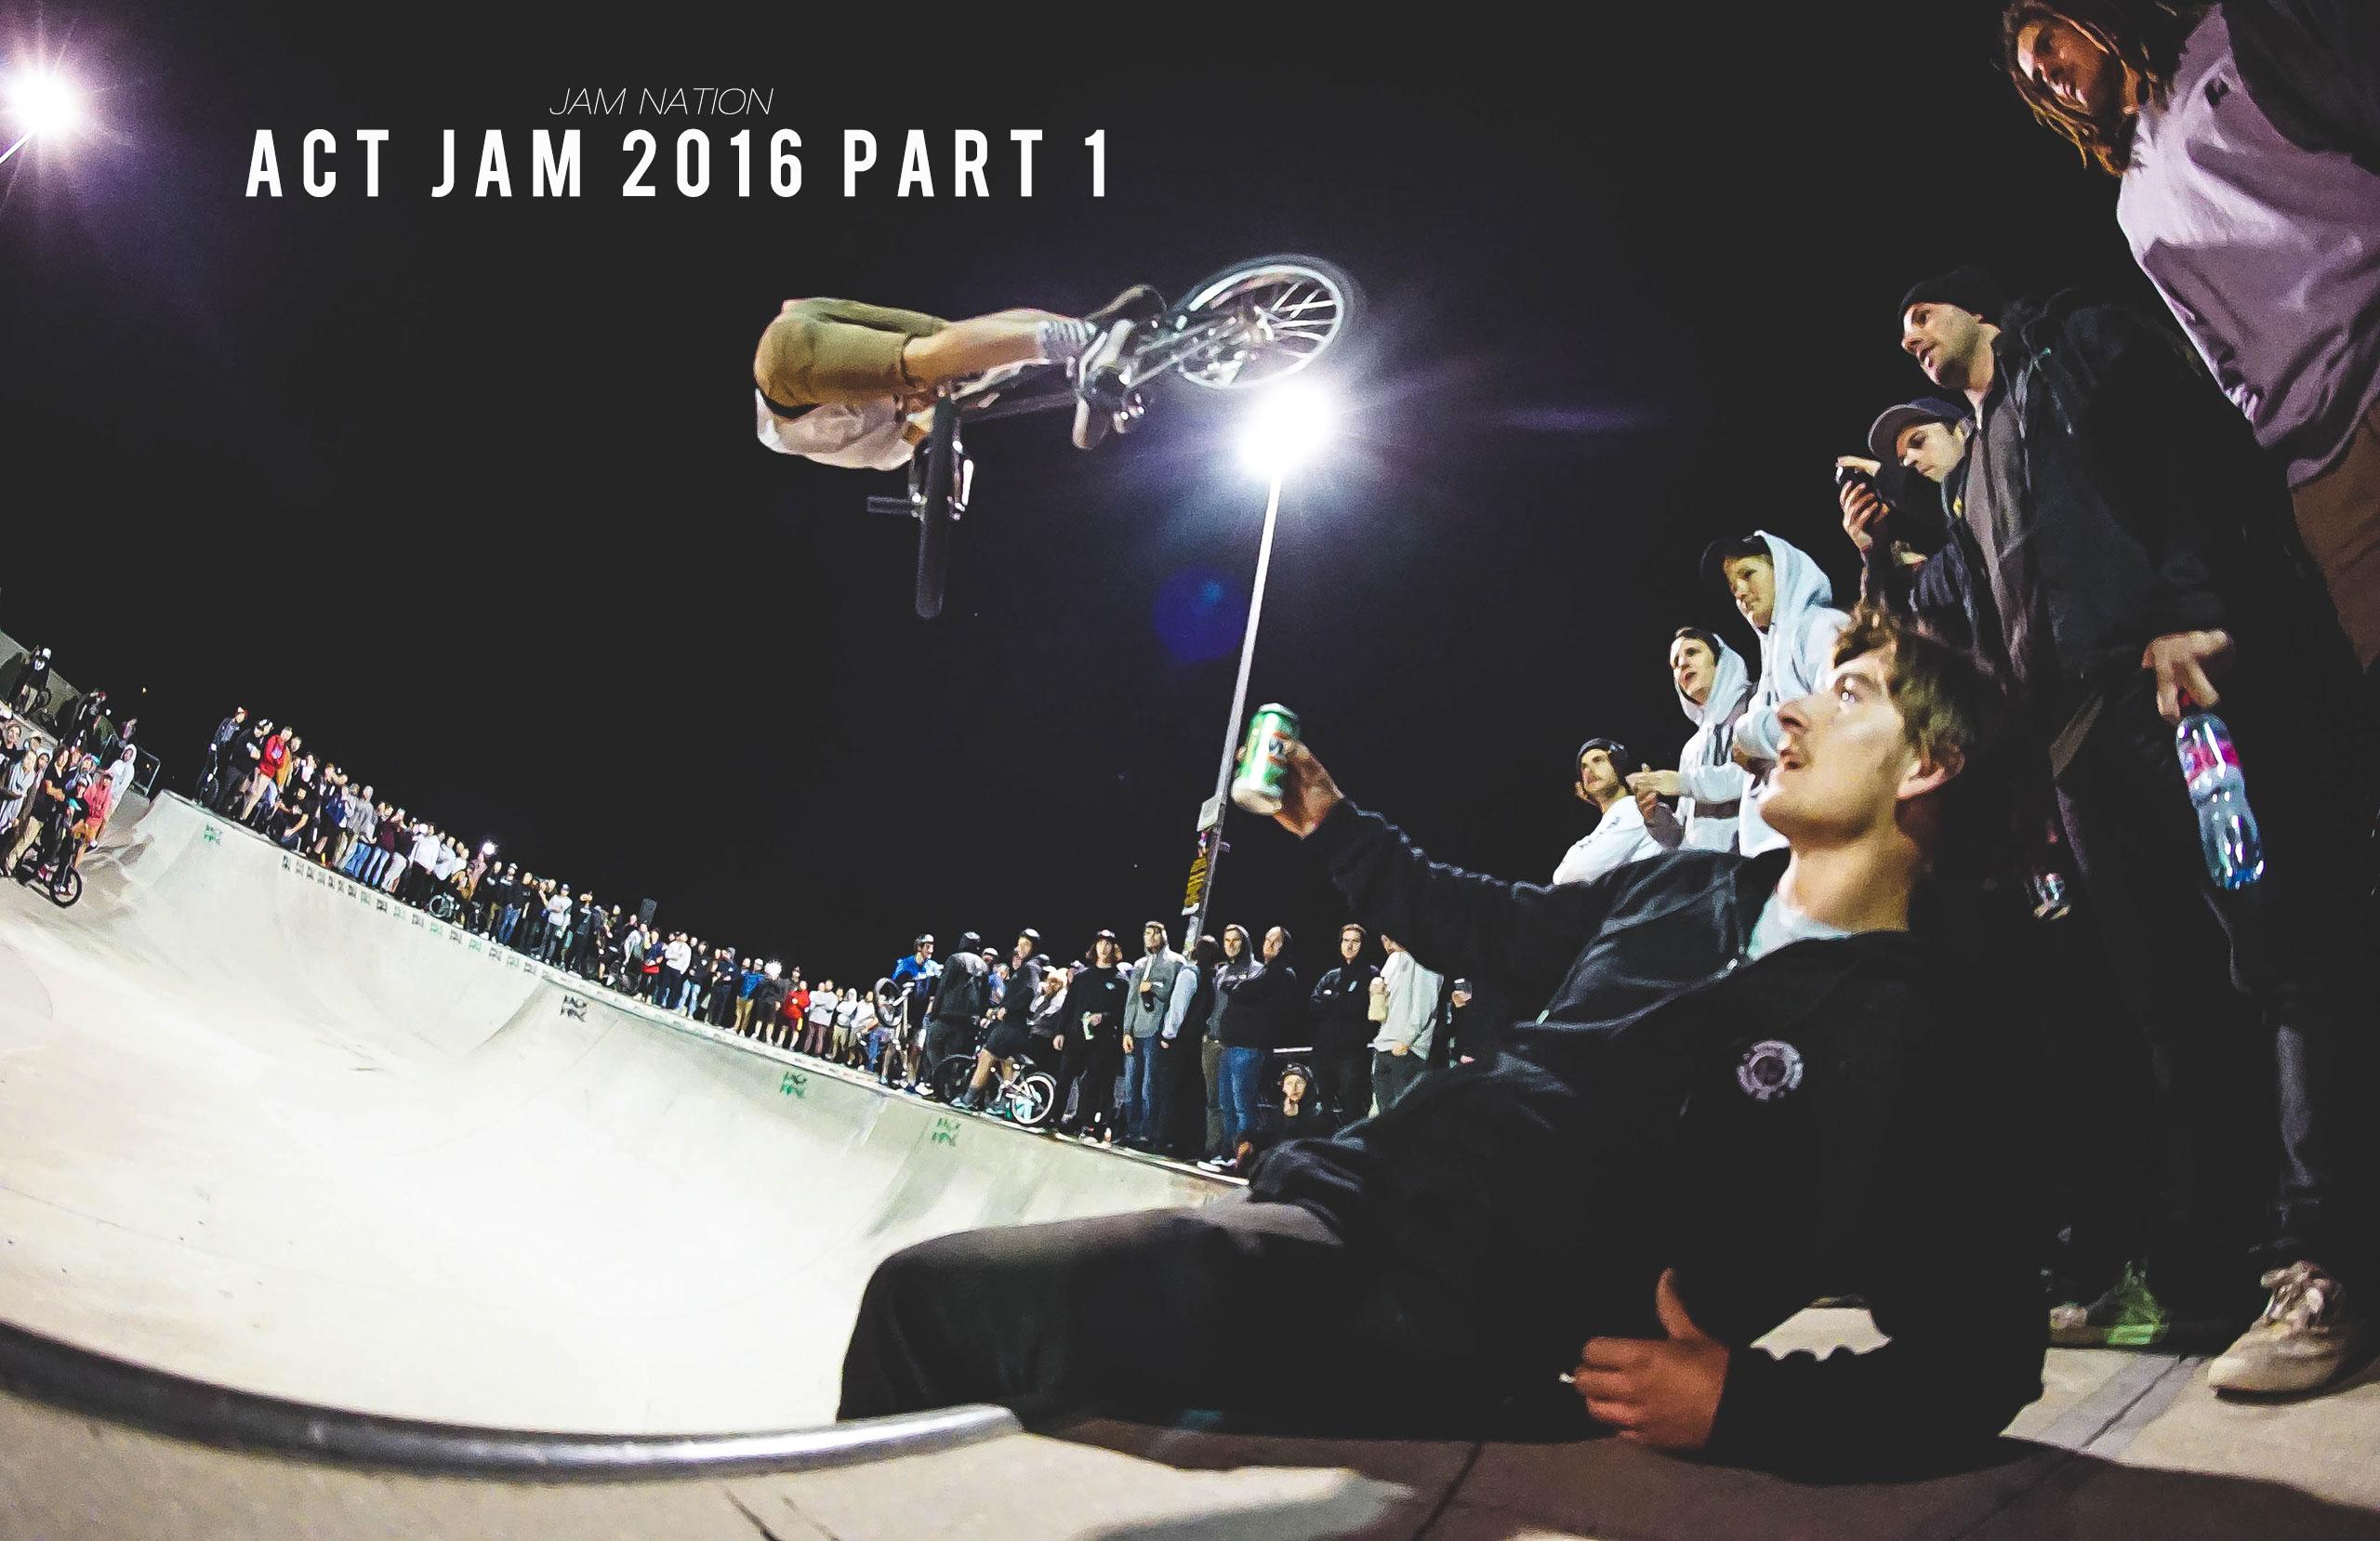 JAM NATION / ACTJAM 2016 / PART 1